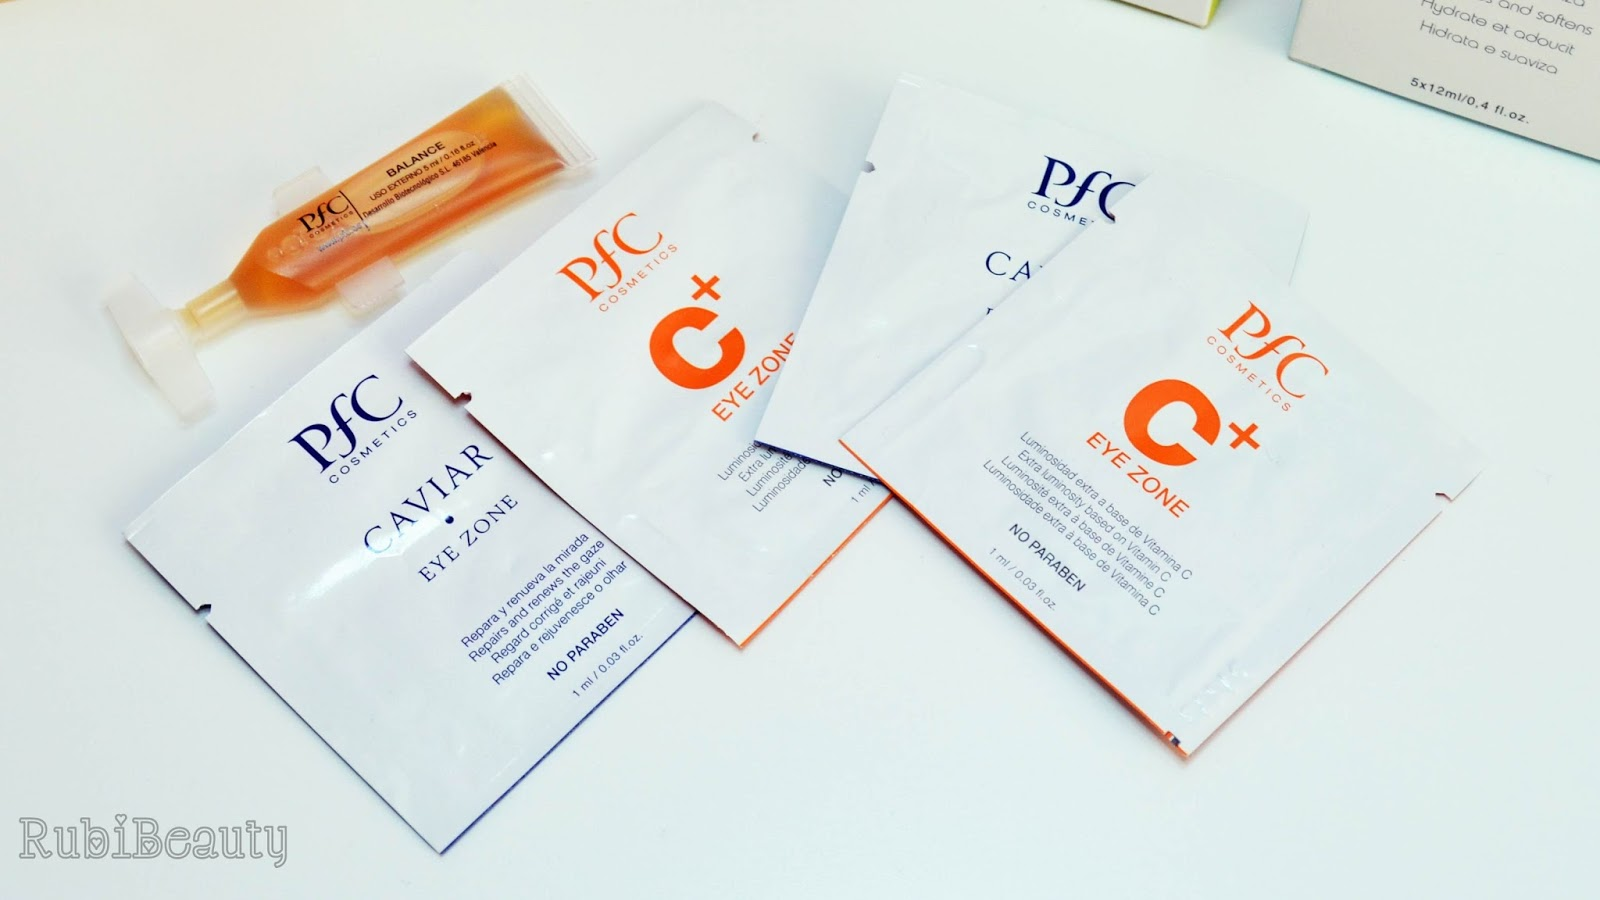 rubibeauty review opinion PFC cosmetics cosmetica profesional piel grasa deshidratada brillos contorno ojos mascarilla serum caviar vitamina C